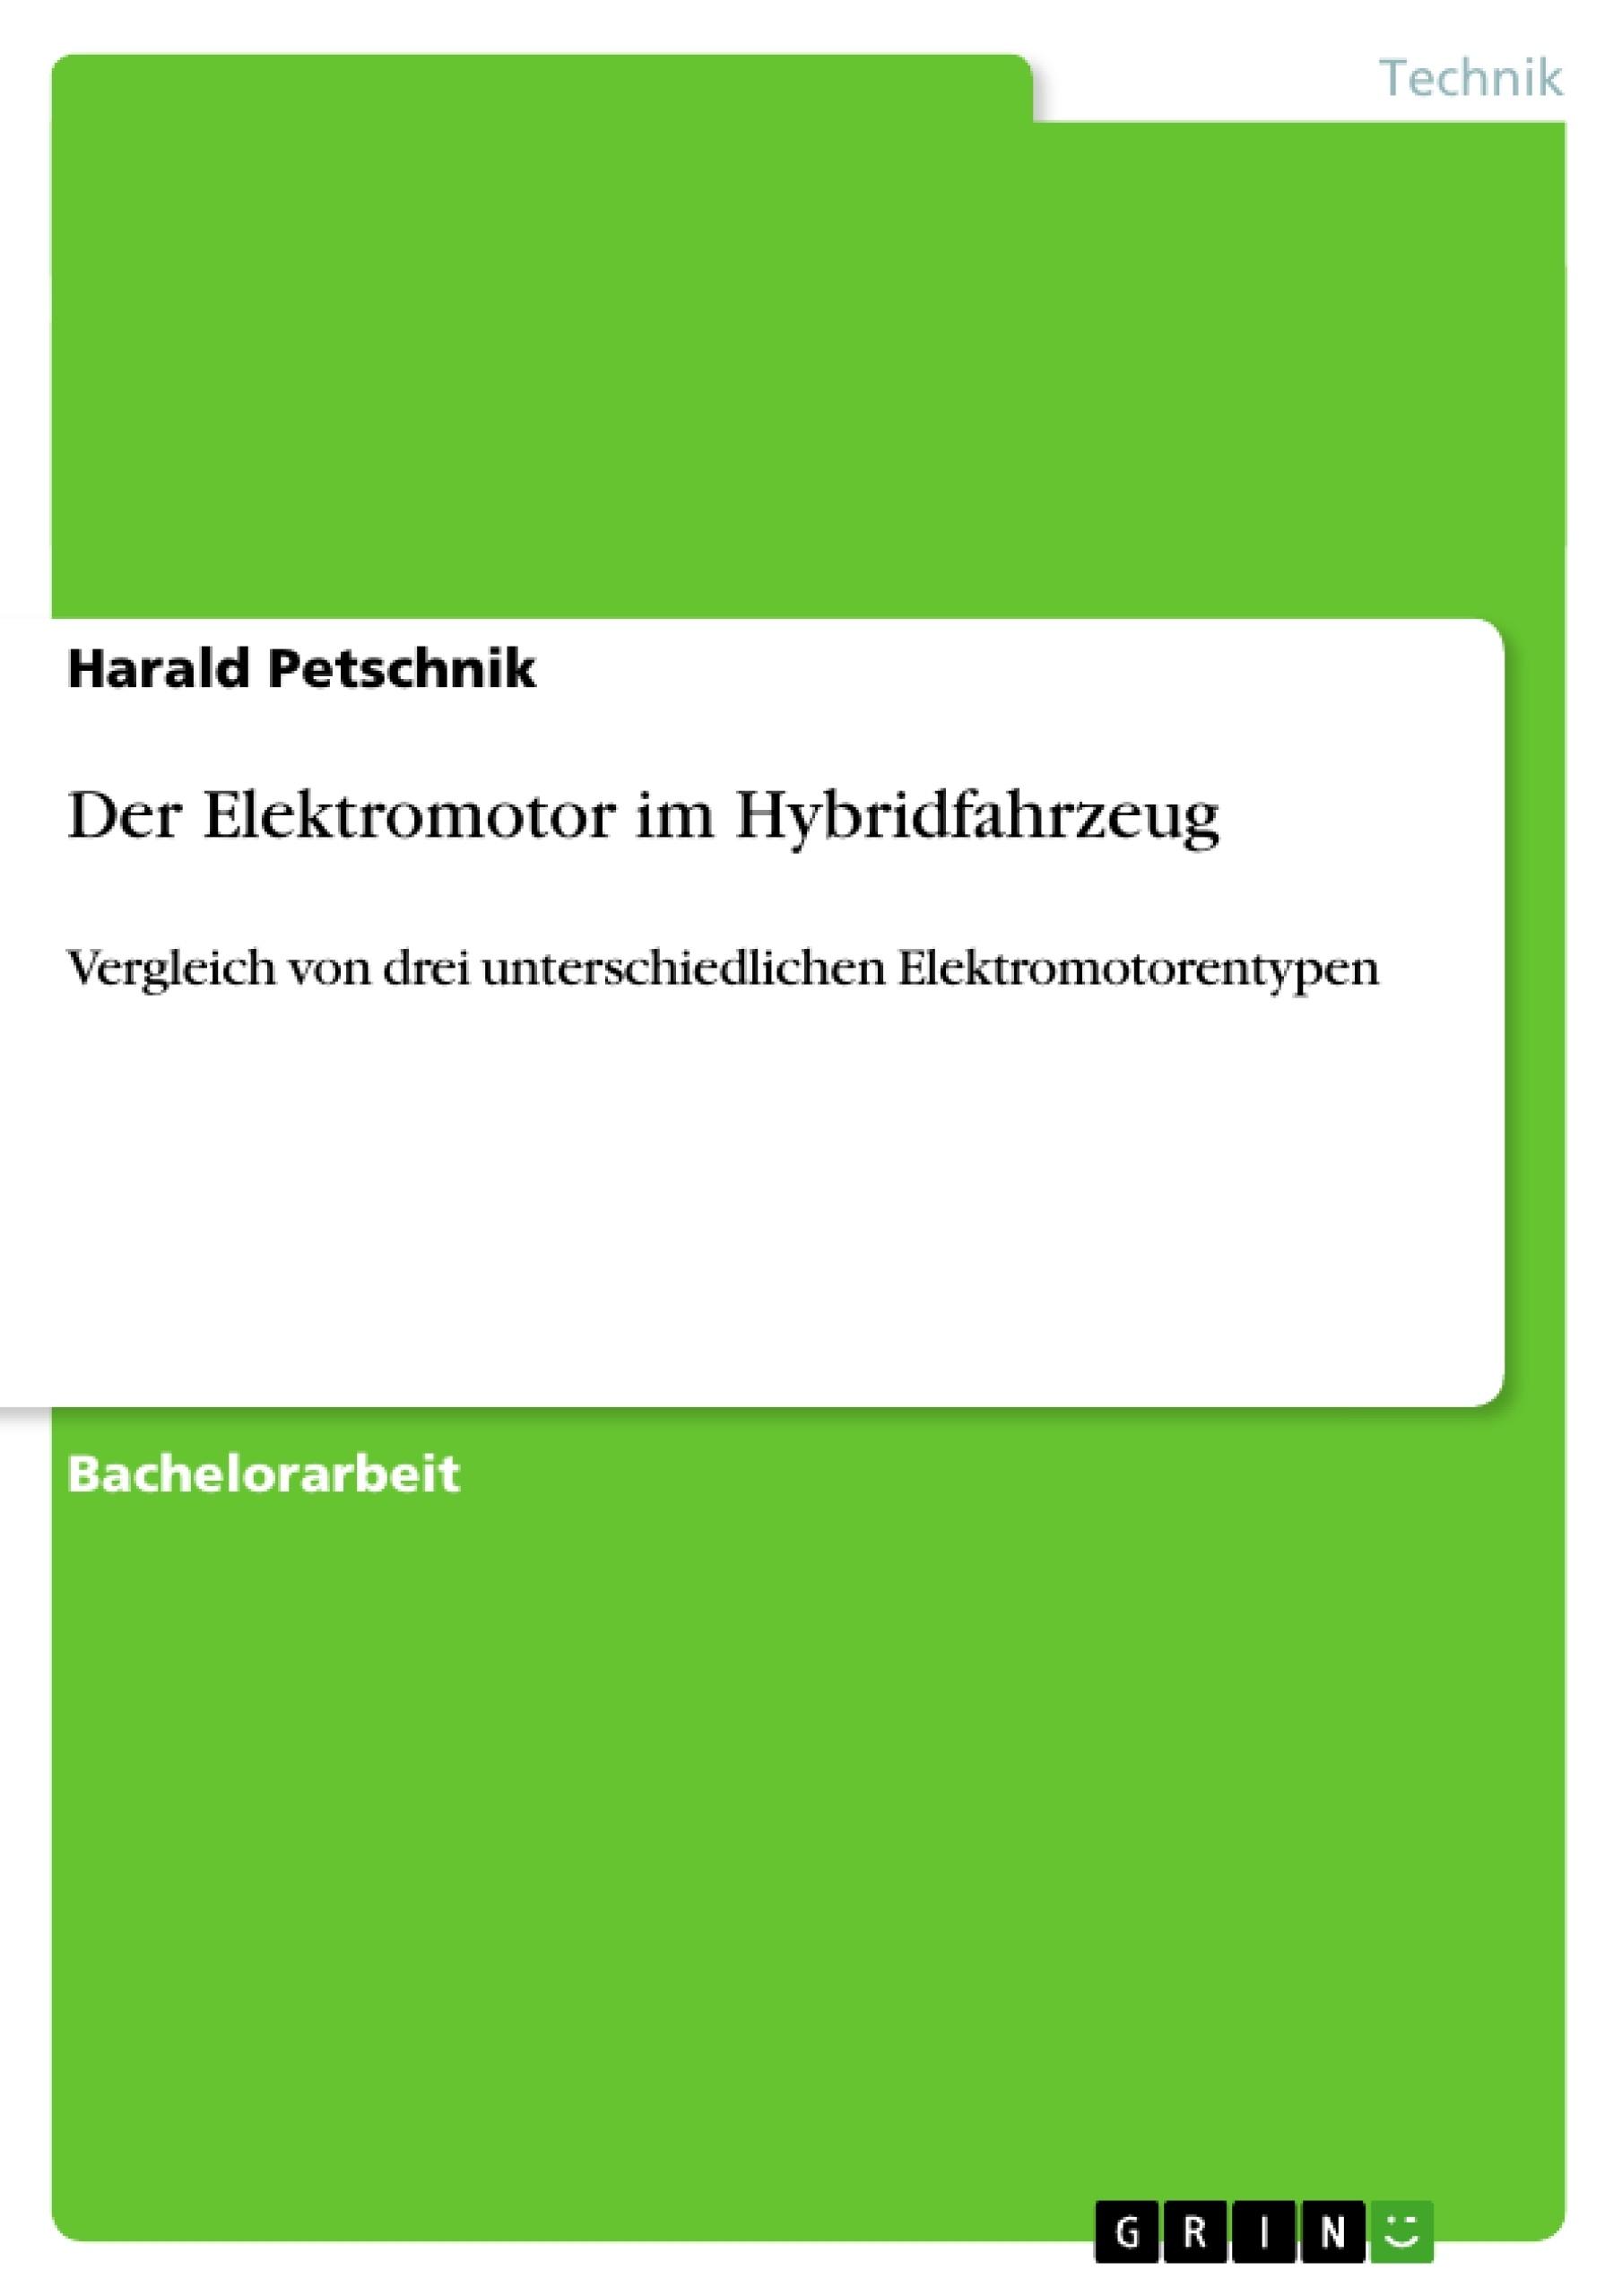 Titel: Der Elektromotor im Hybridfahrzeug